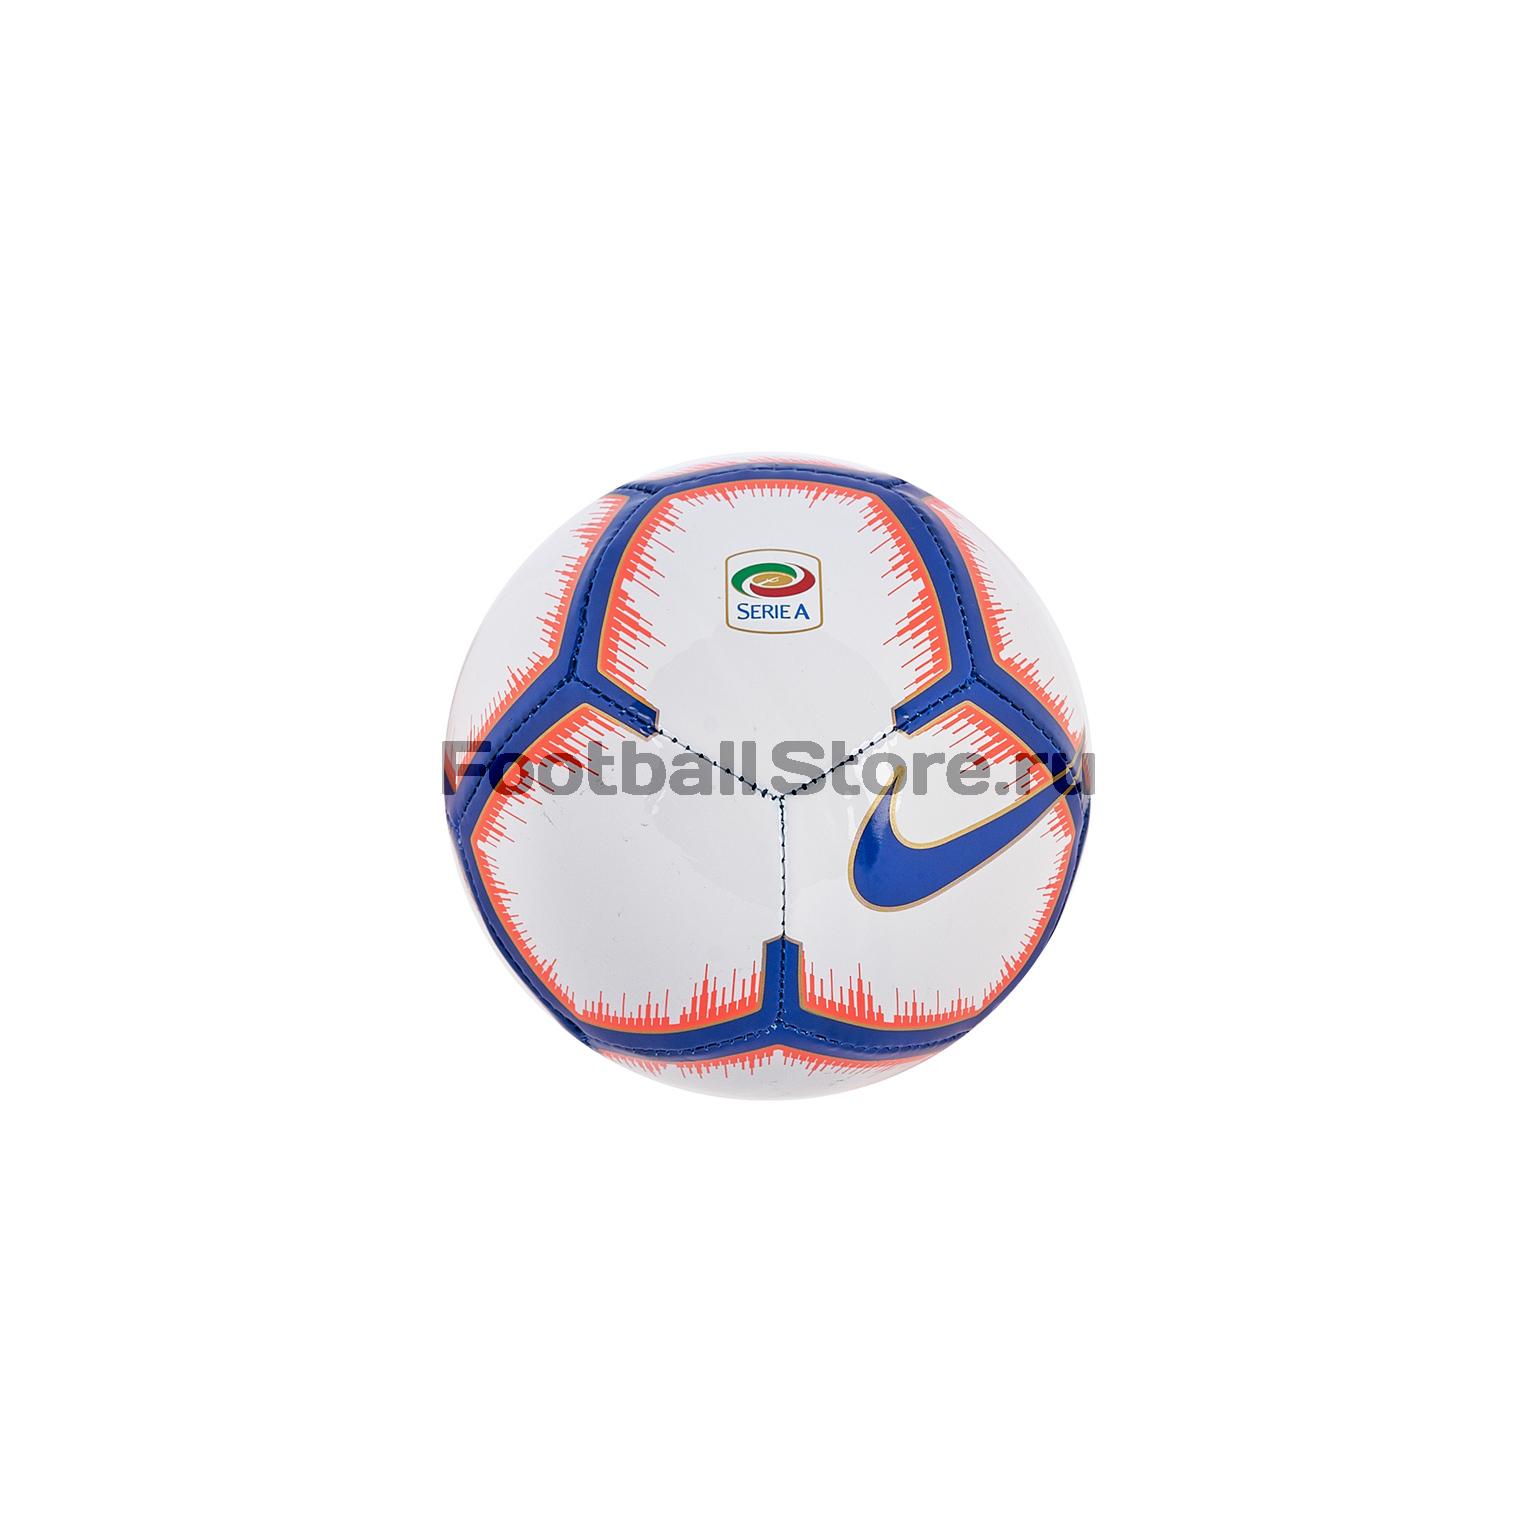 Мяч сувенирный Nike Serie A SC3375-100